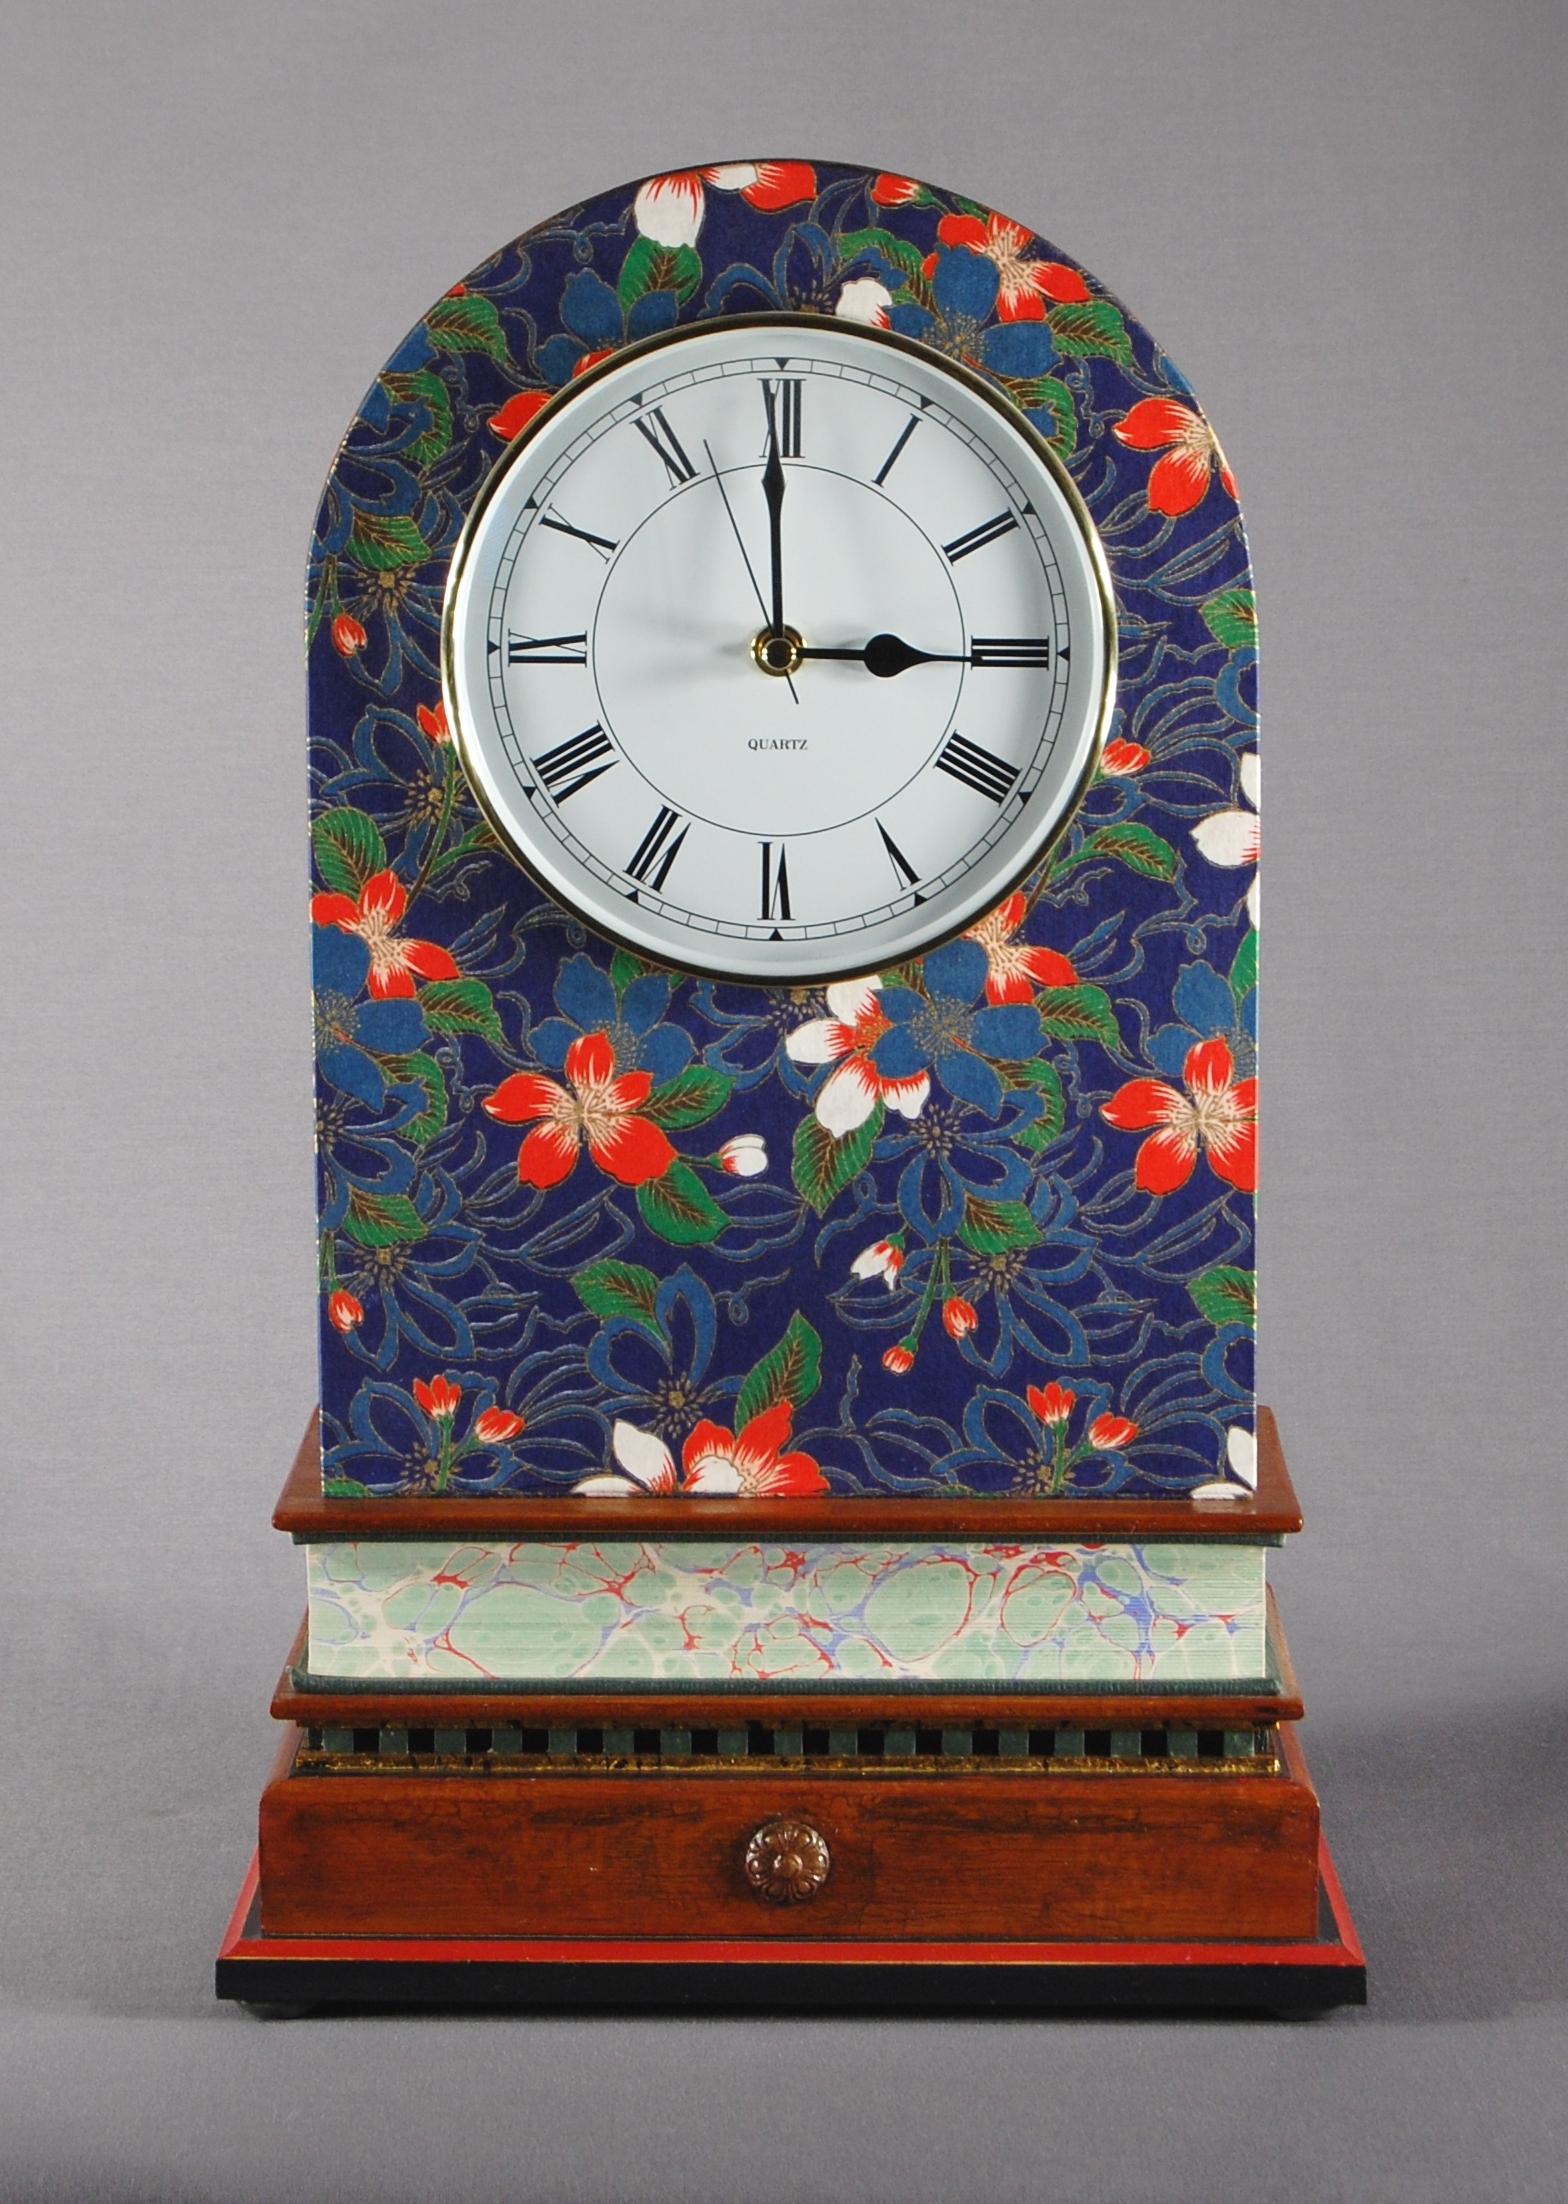 austerity clock #171